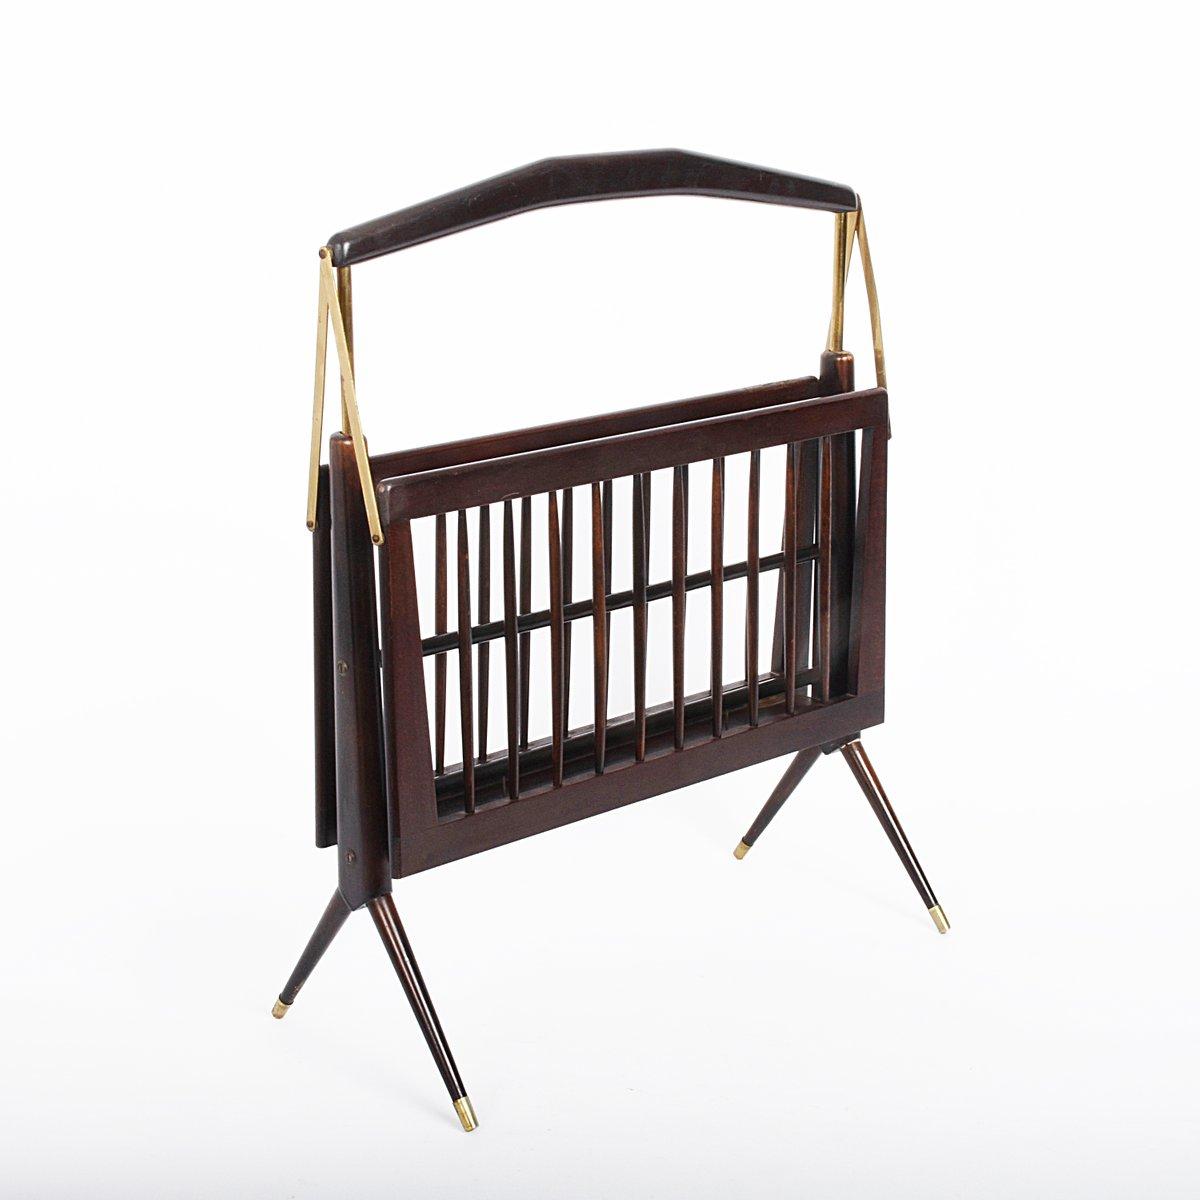 zeitungsst nder aus holz messing von cesare lacca. Black Bedroom Furniture Sets. Home Design Ideas